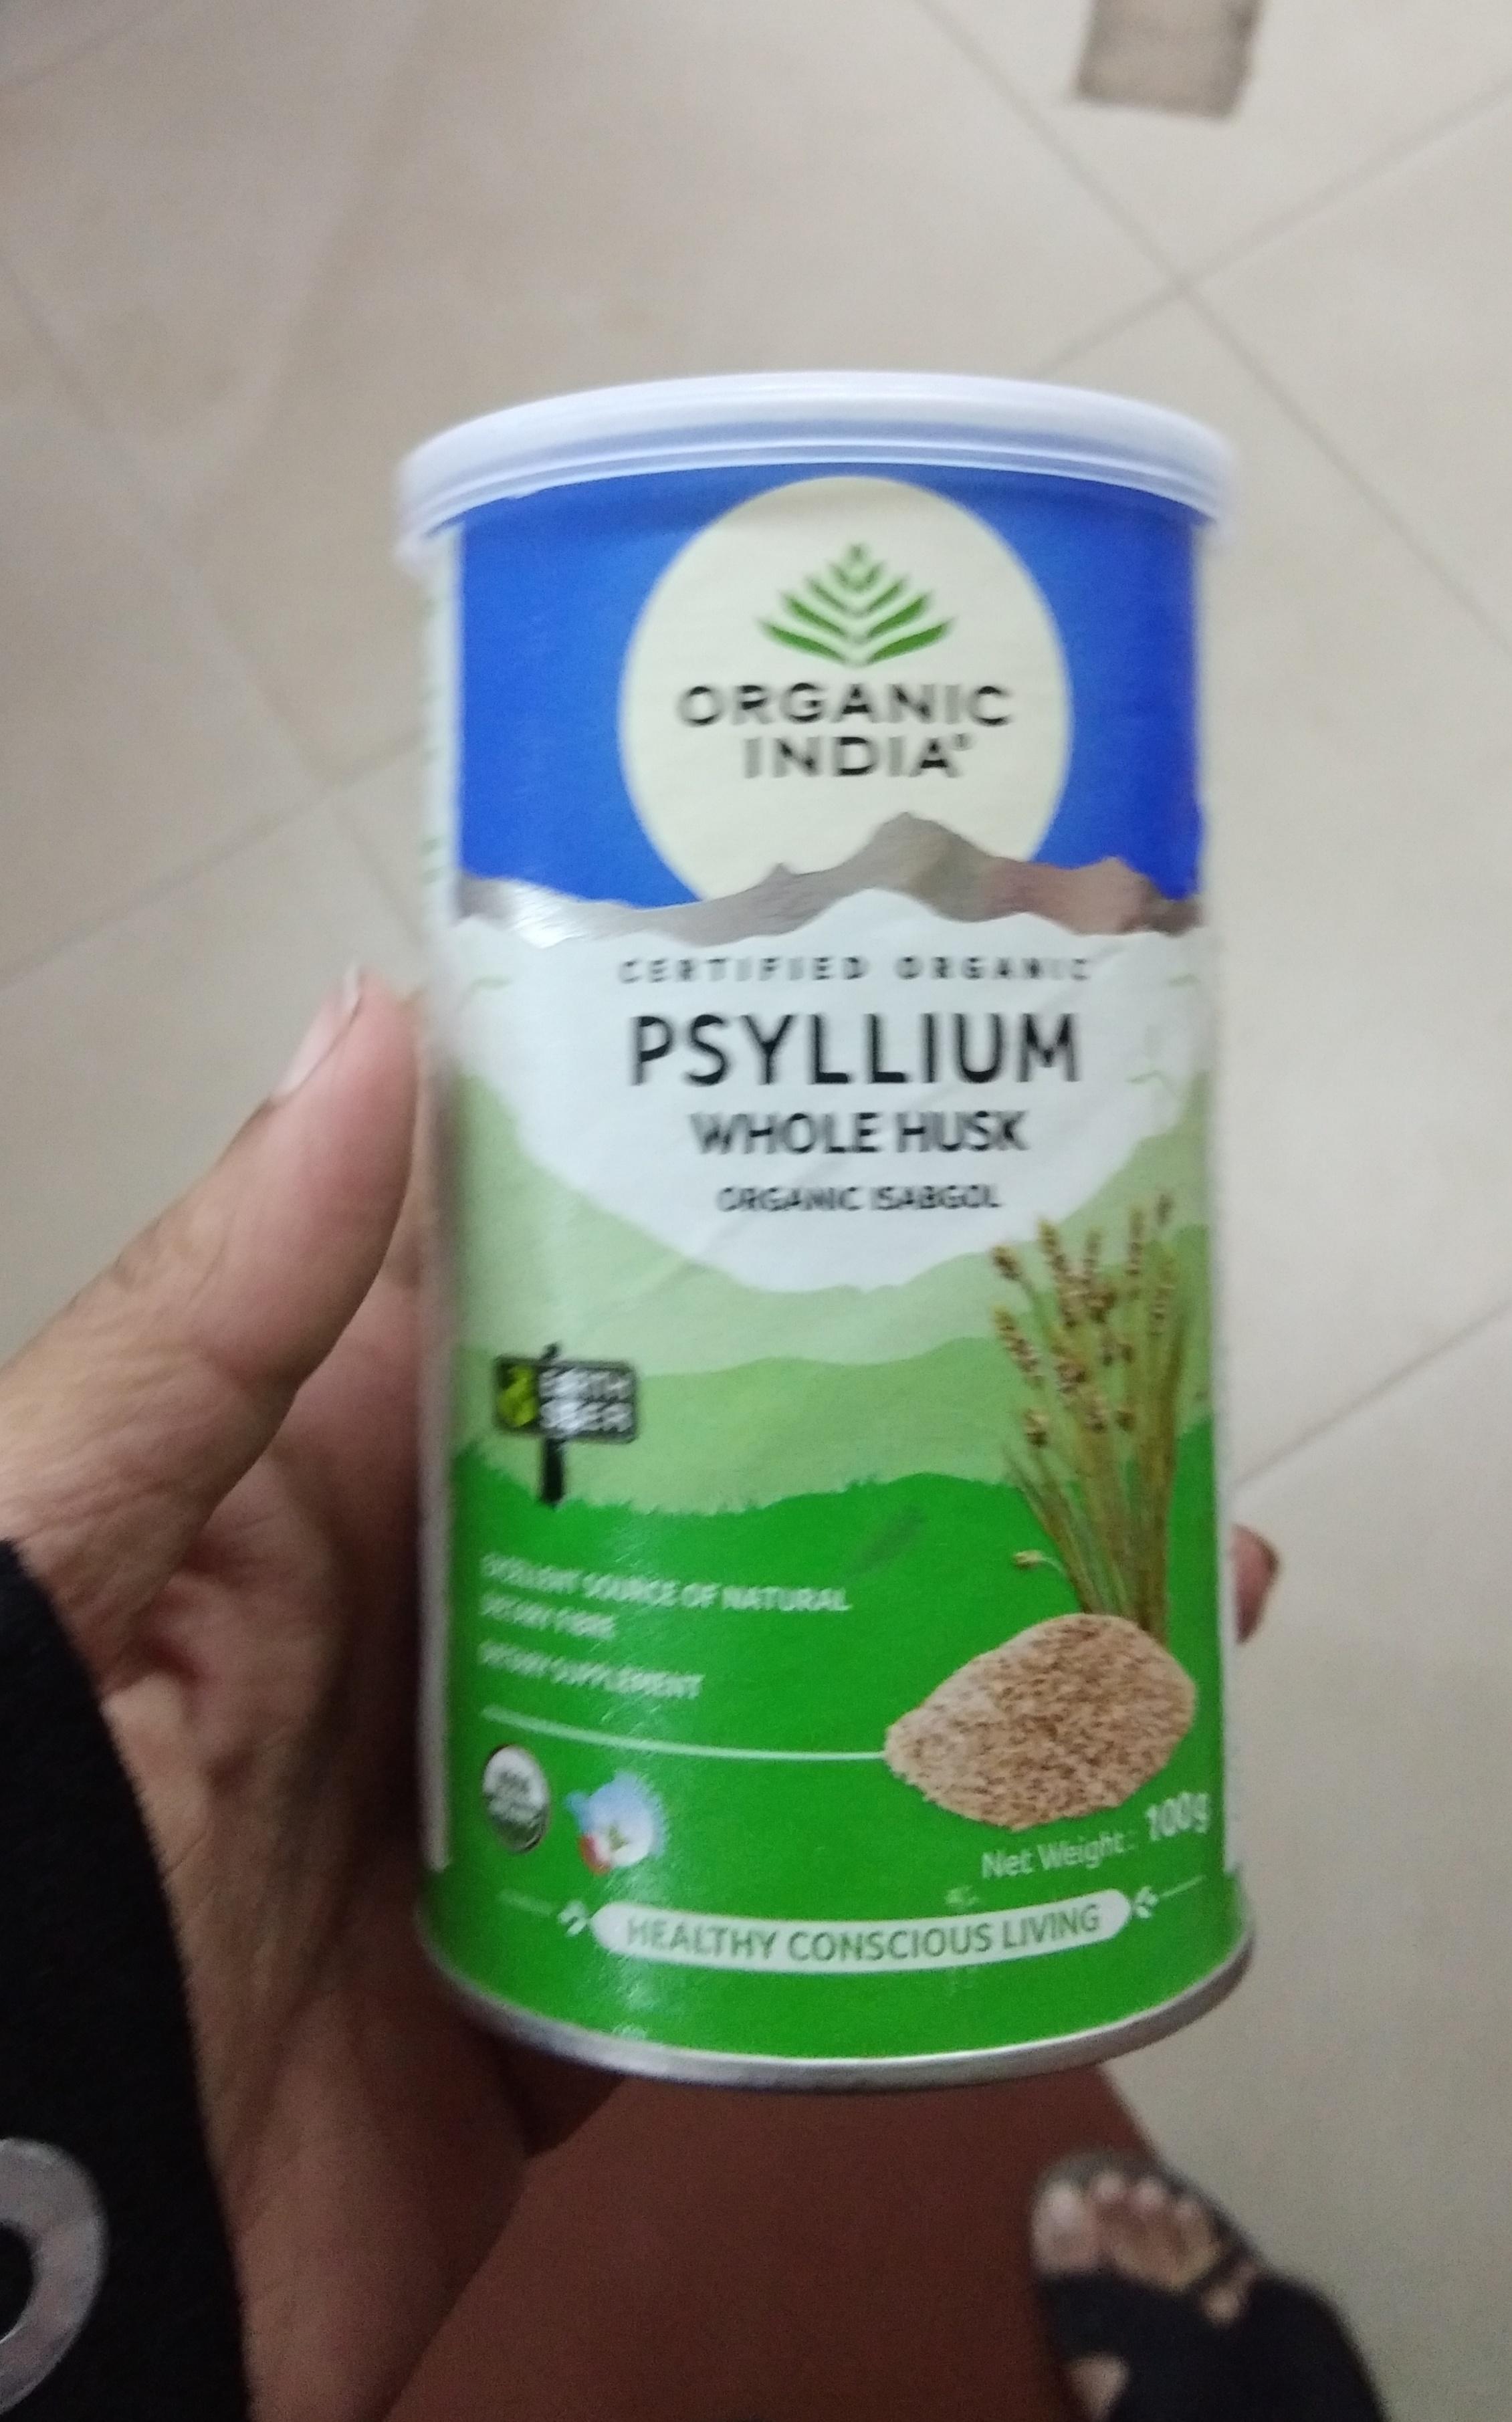 Organic India Whole Husk Psyllium-Amazing product-By Nasreen-1